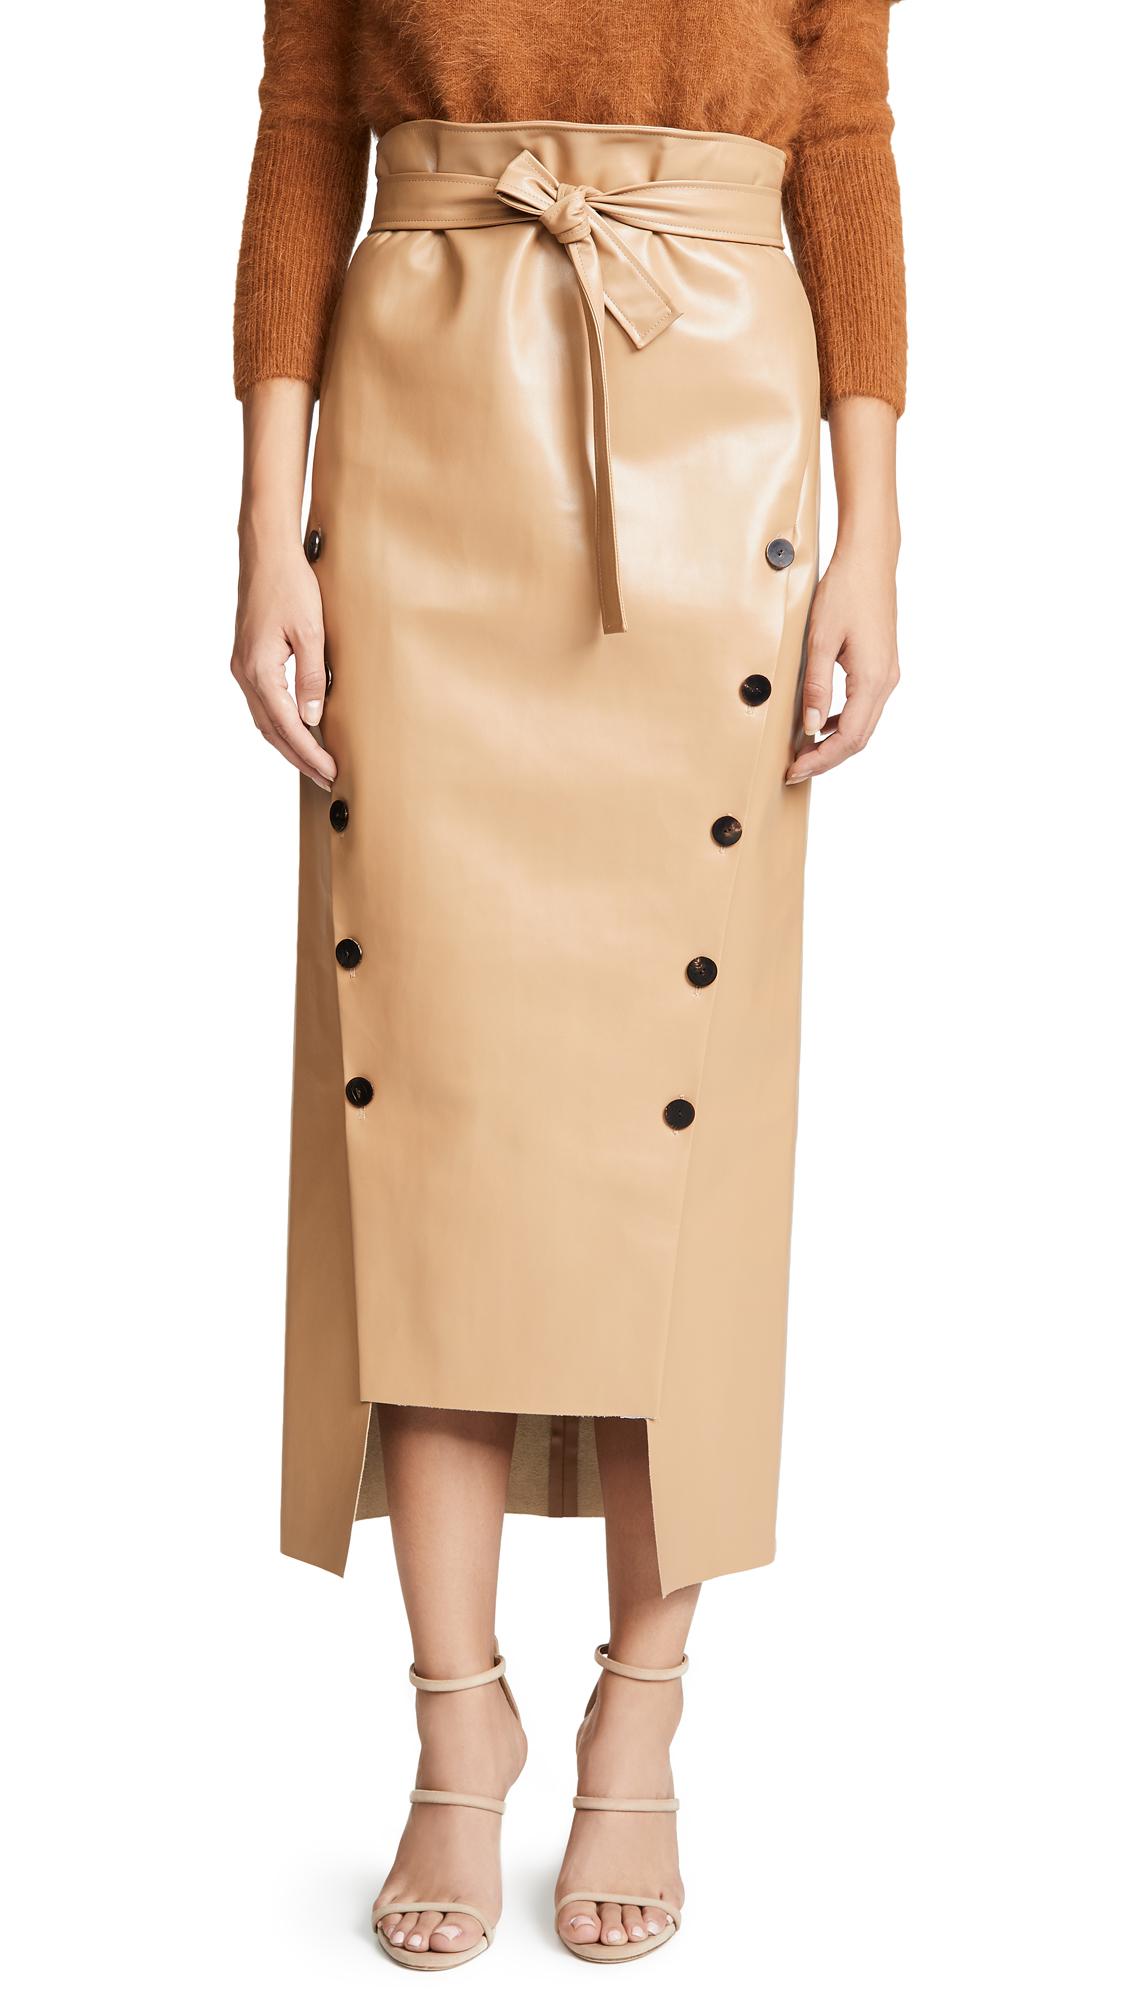 A.W.A.K.E. Double Button Front Tie Waist Skirt In Beige